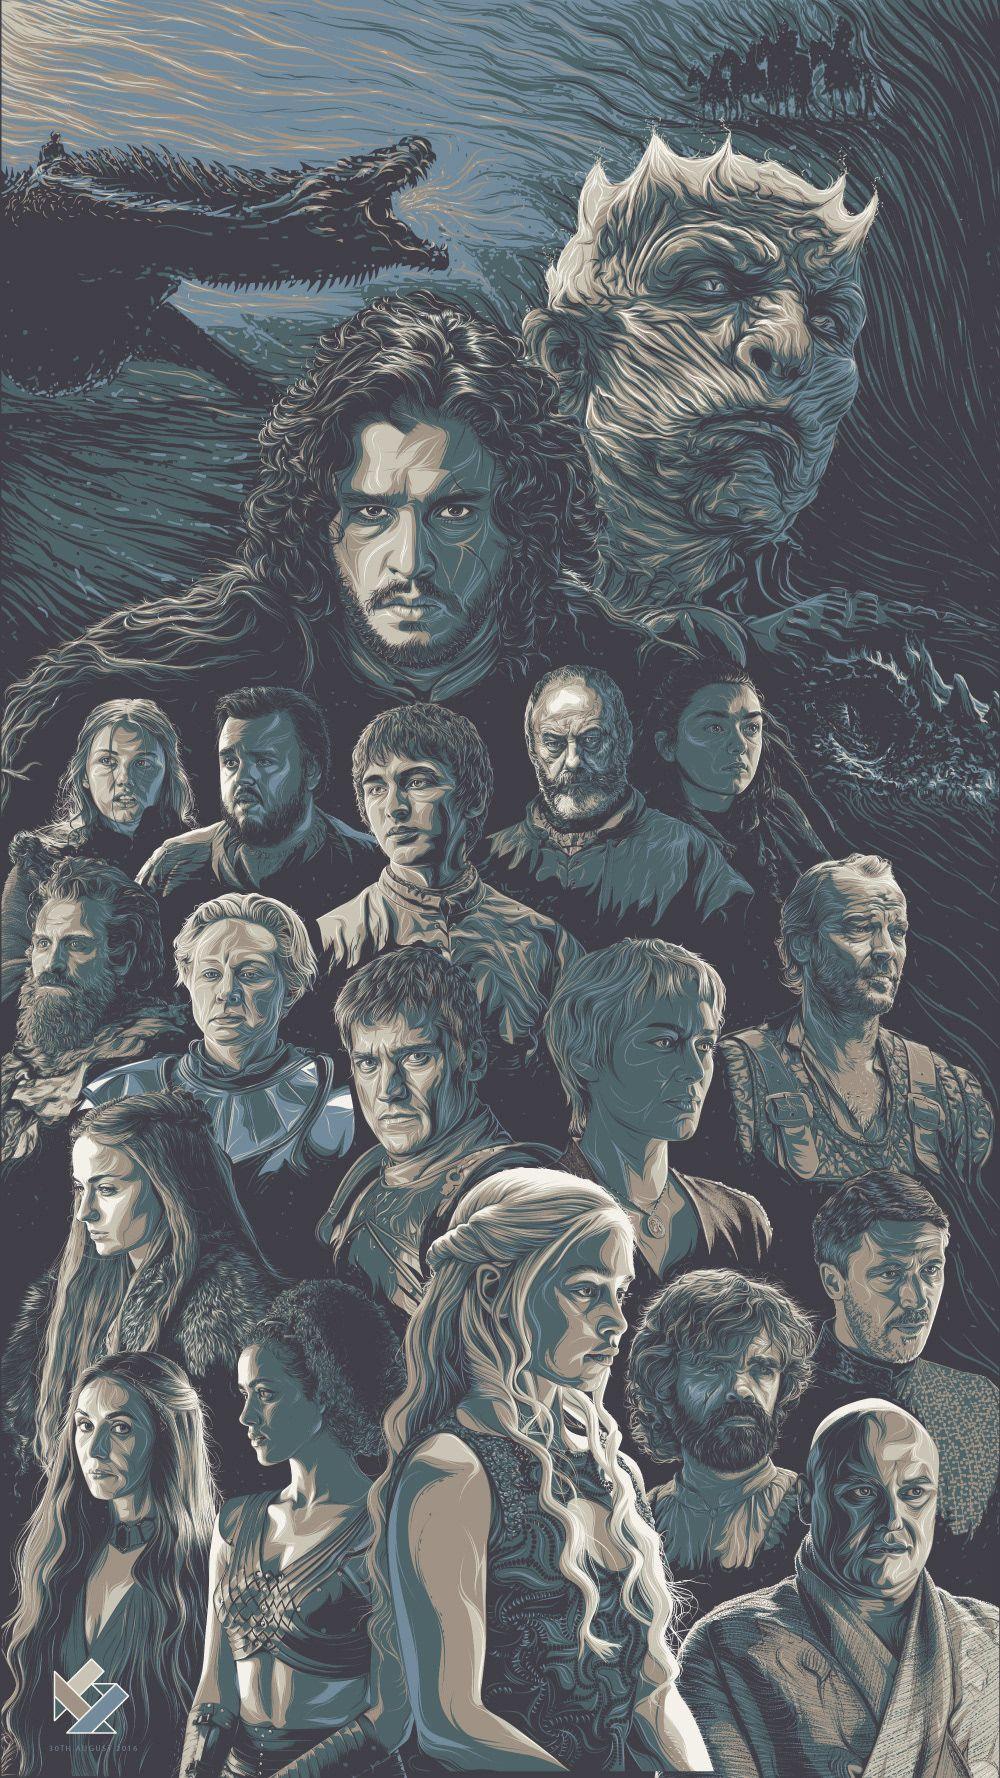 Game of Thrones Art Tribute